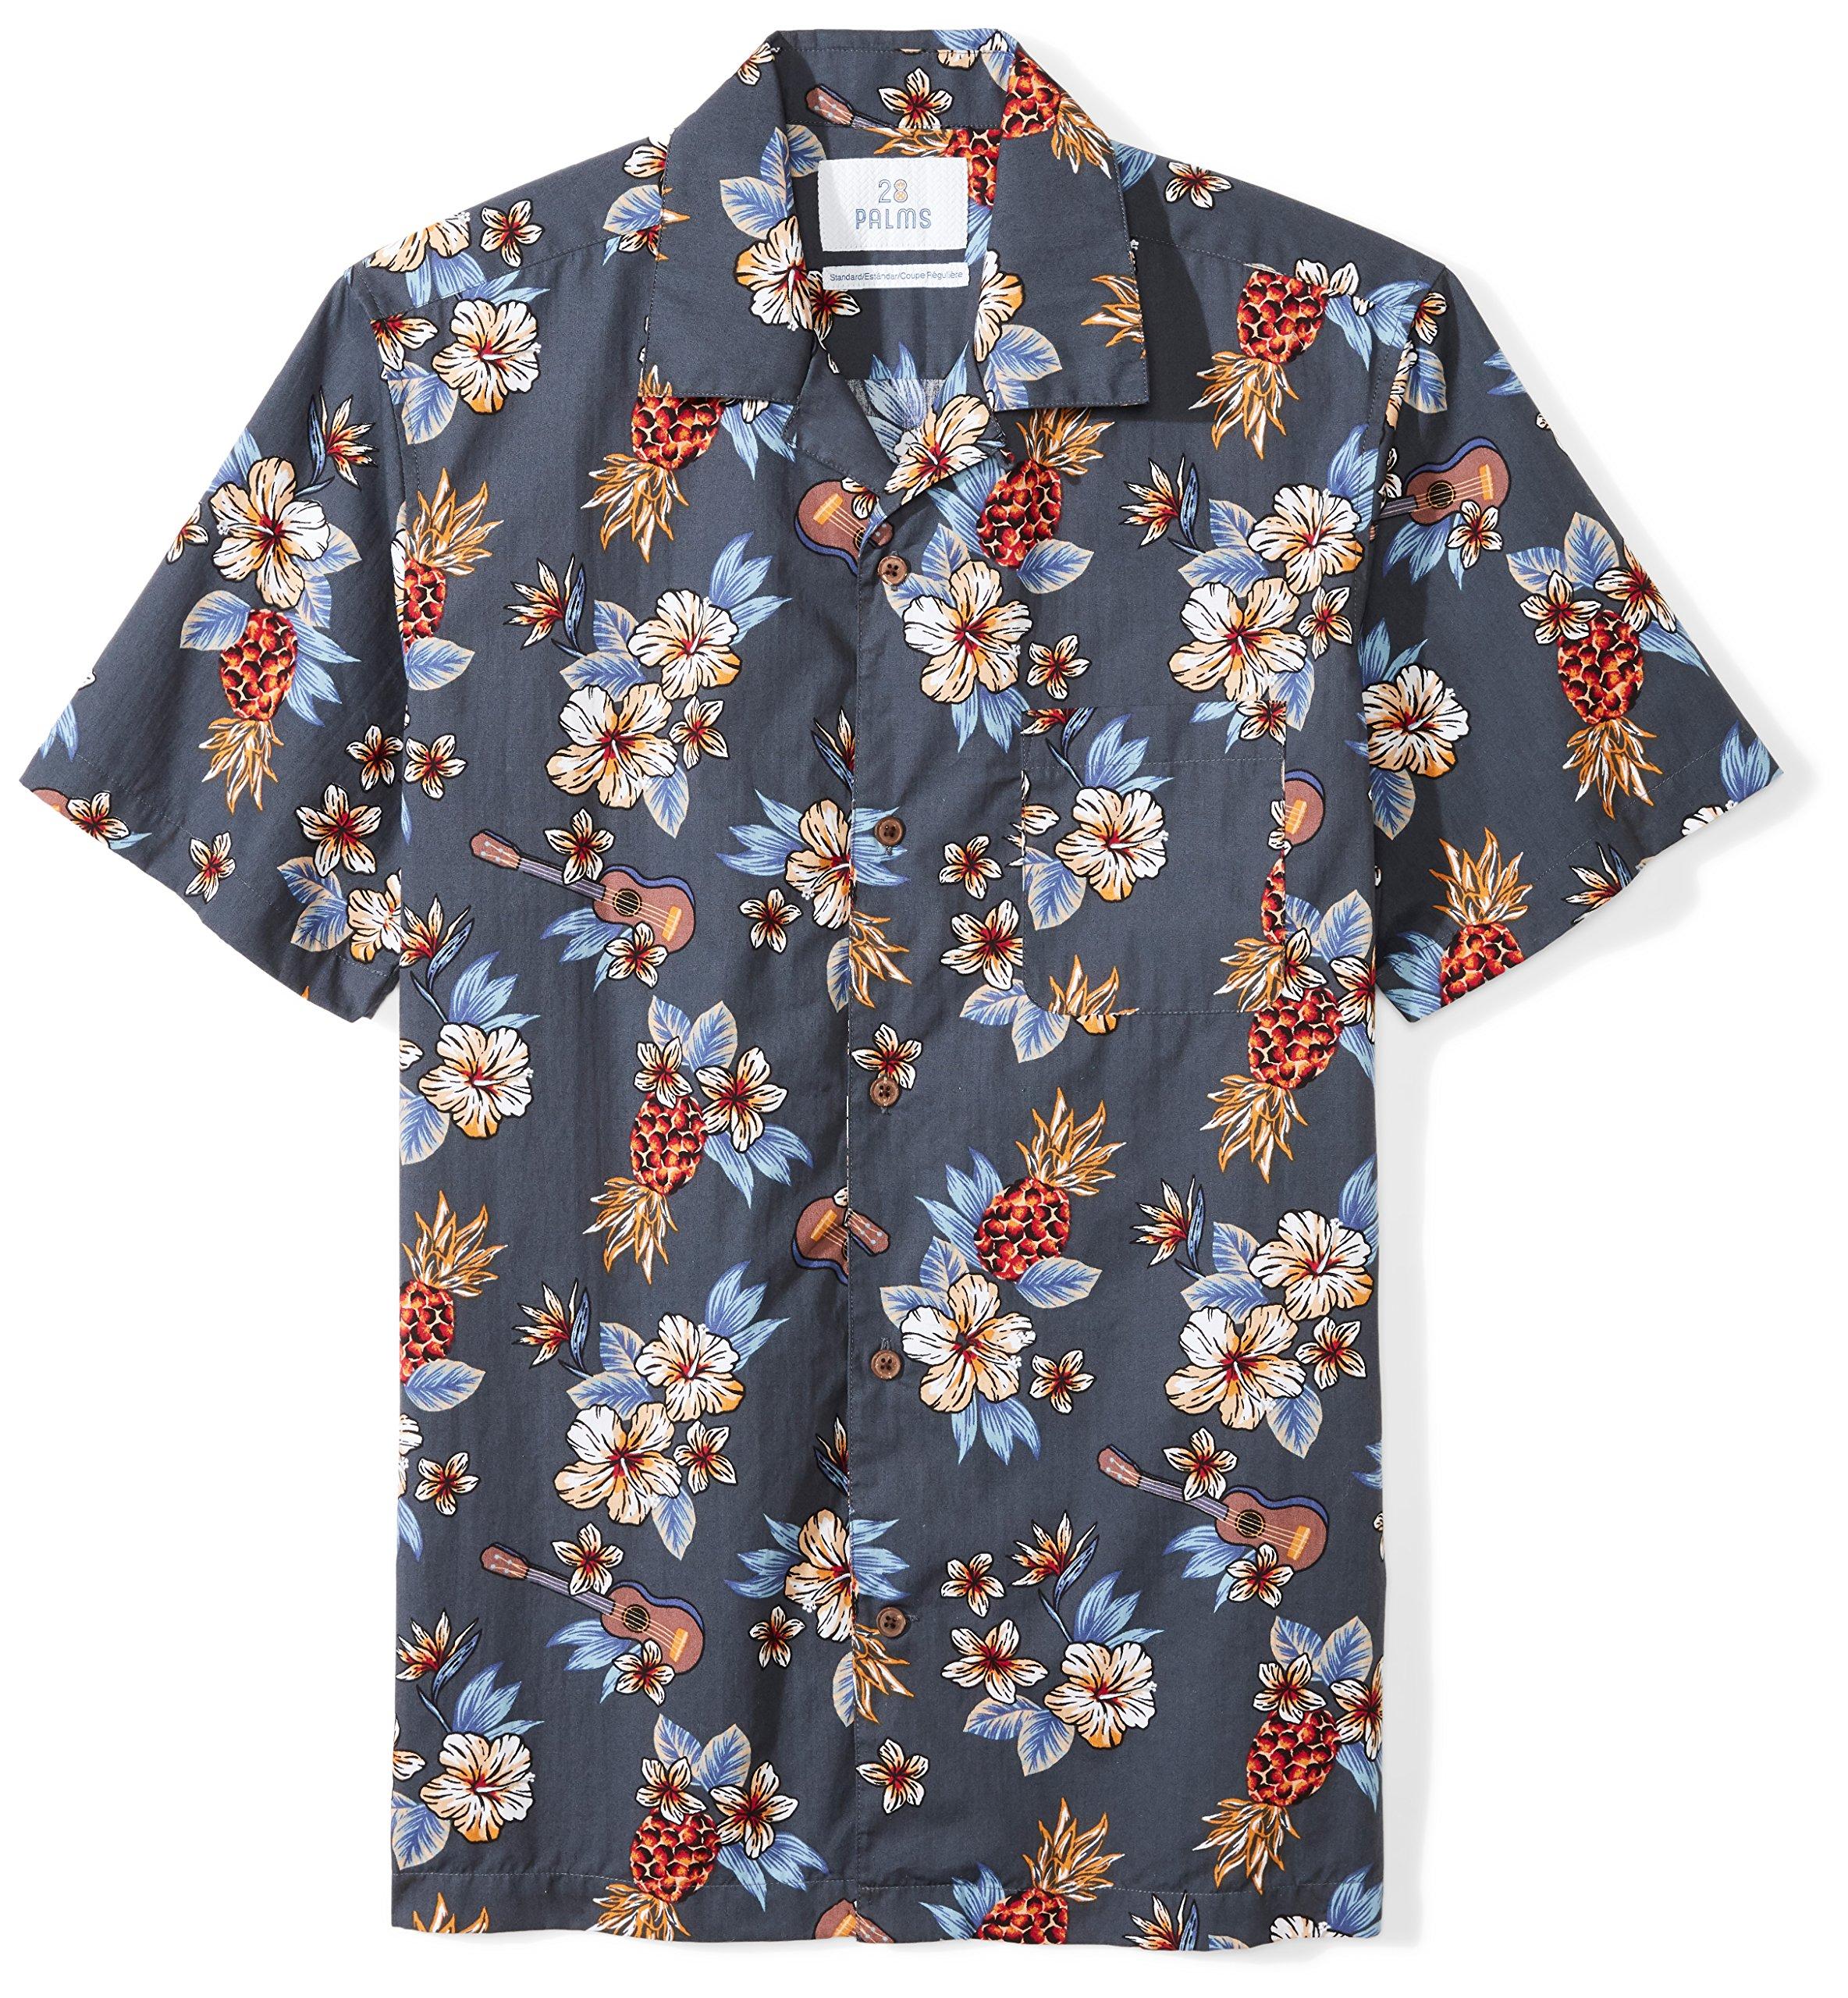 28 Palms Men's Standard-Fit 100% Cotton Tropical Hawaiian Shirt, Blue Guitar Floral, Large by 28 Palms